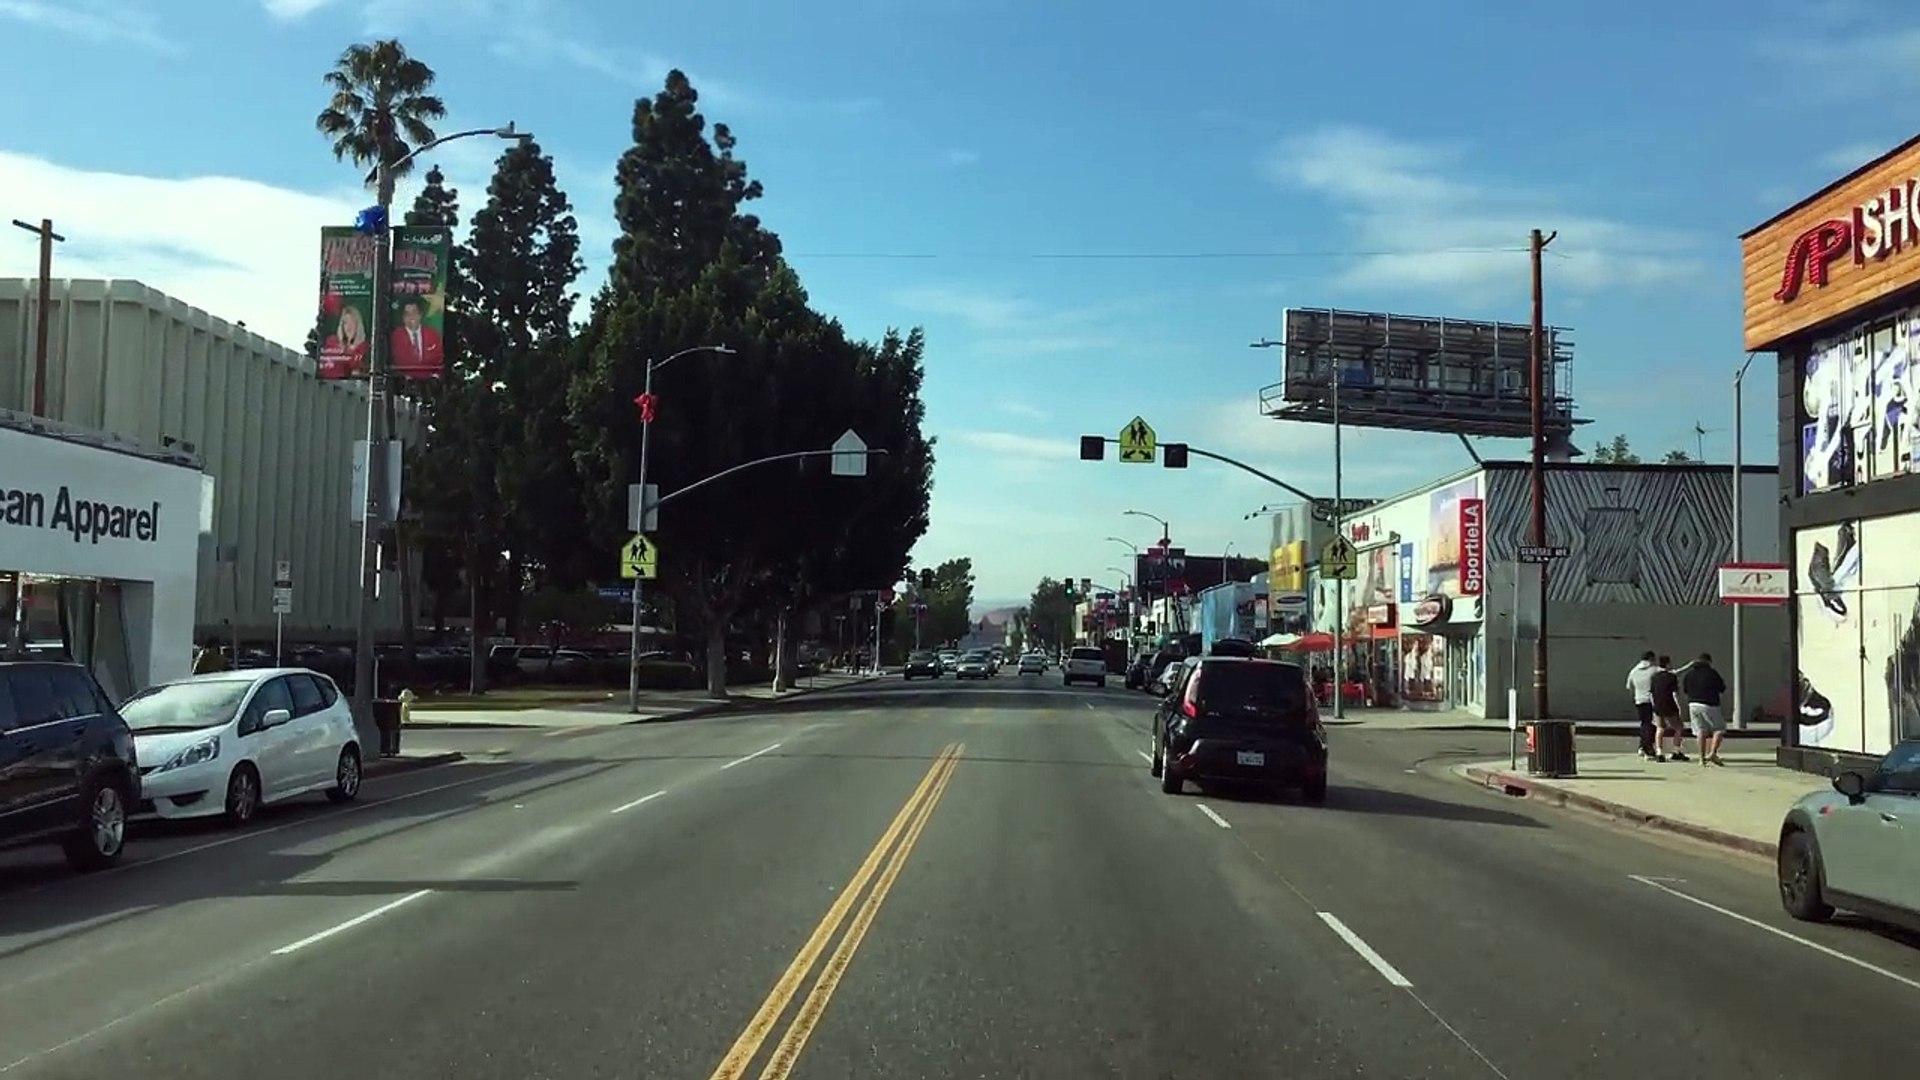 Driving Downtown - LAs Melrose Avenue - Los Angeles California USA